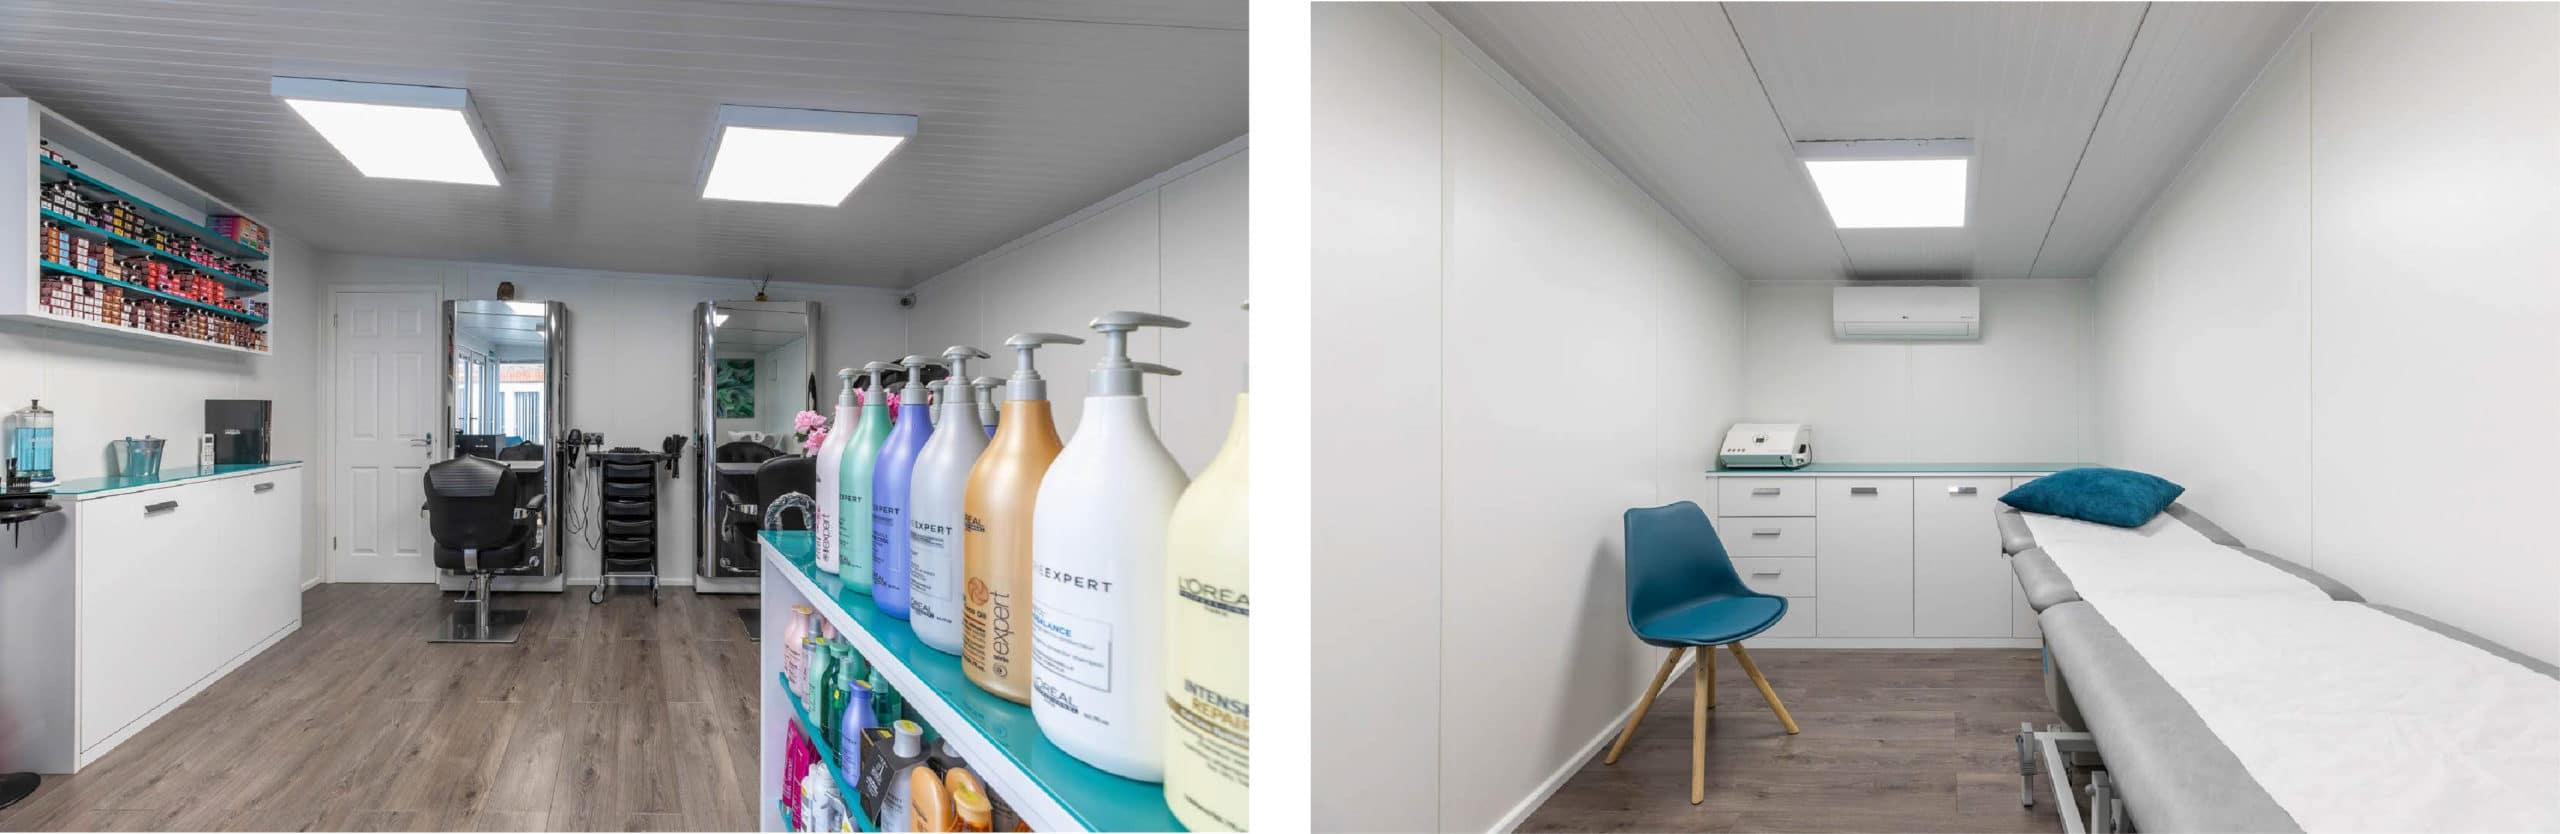 Garden Hair Salon with Partition Walls